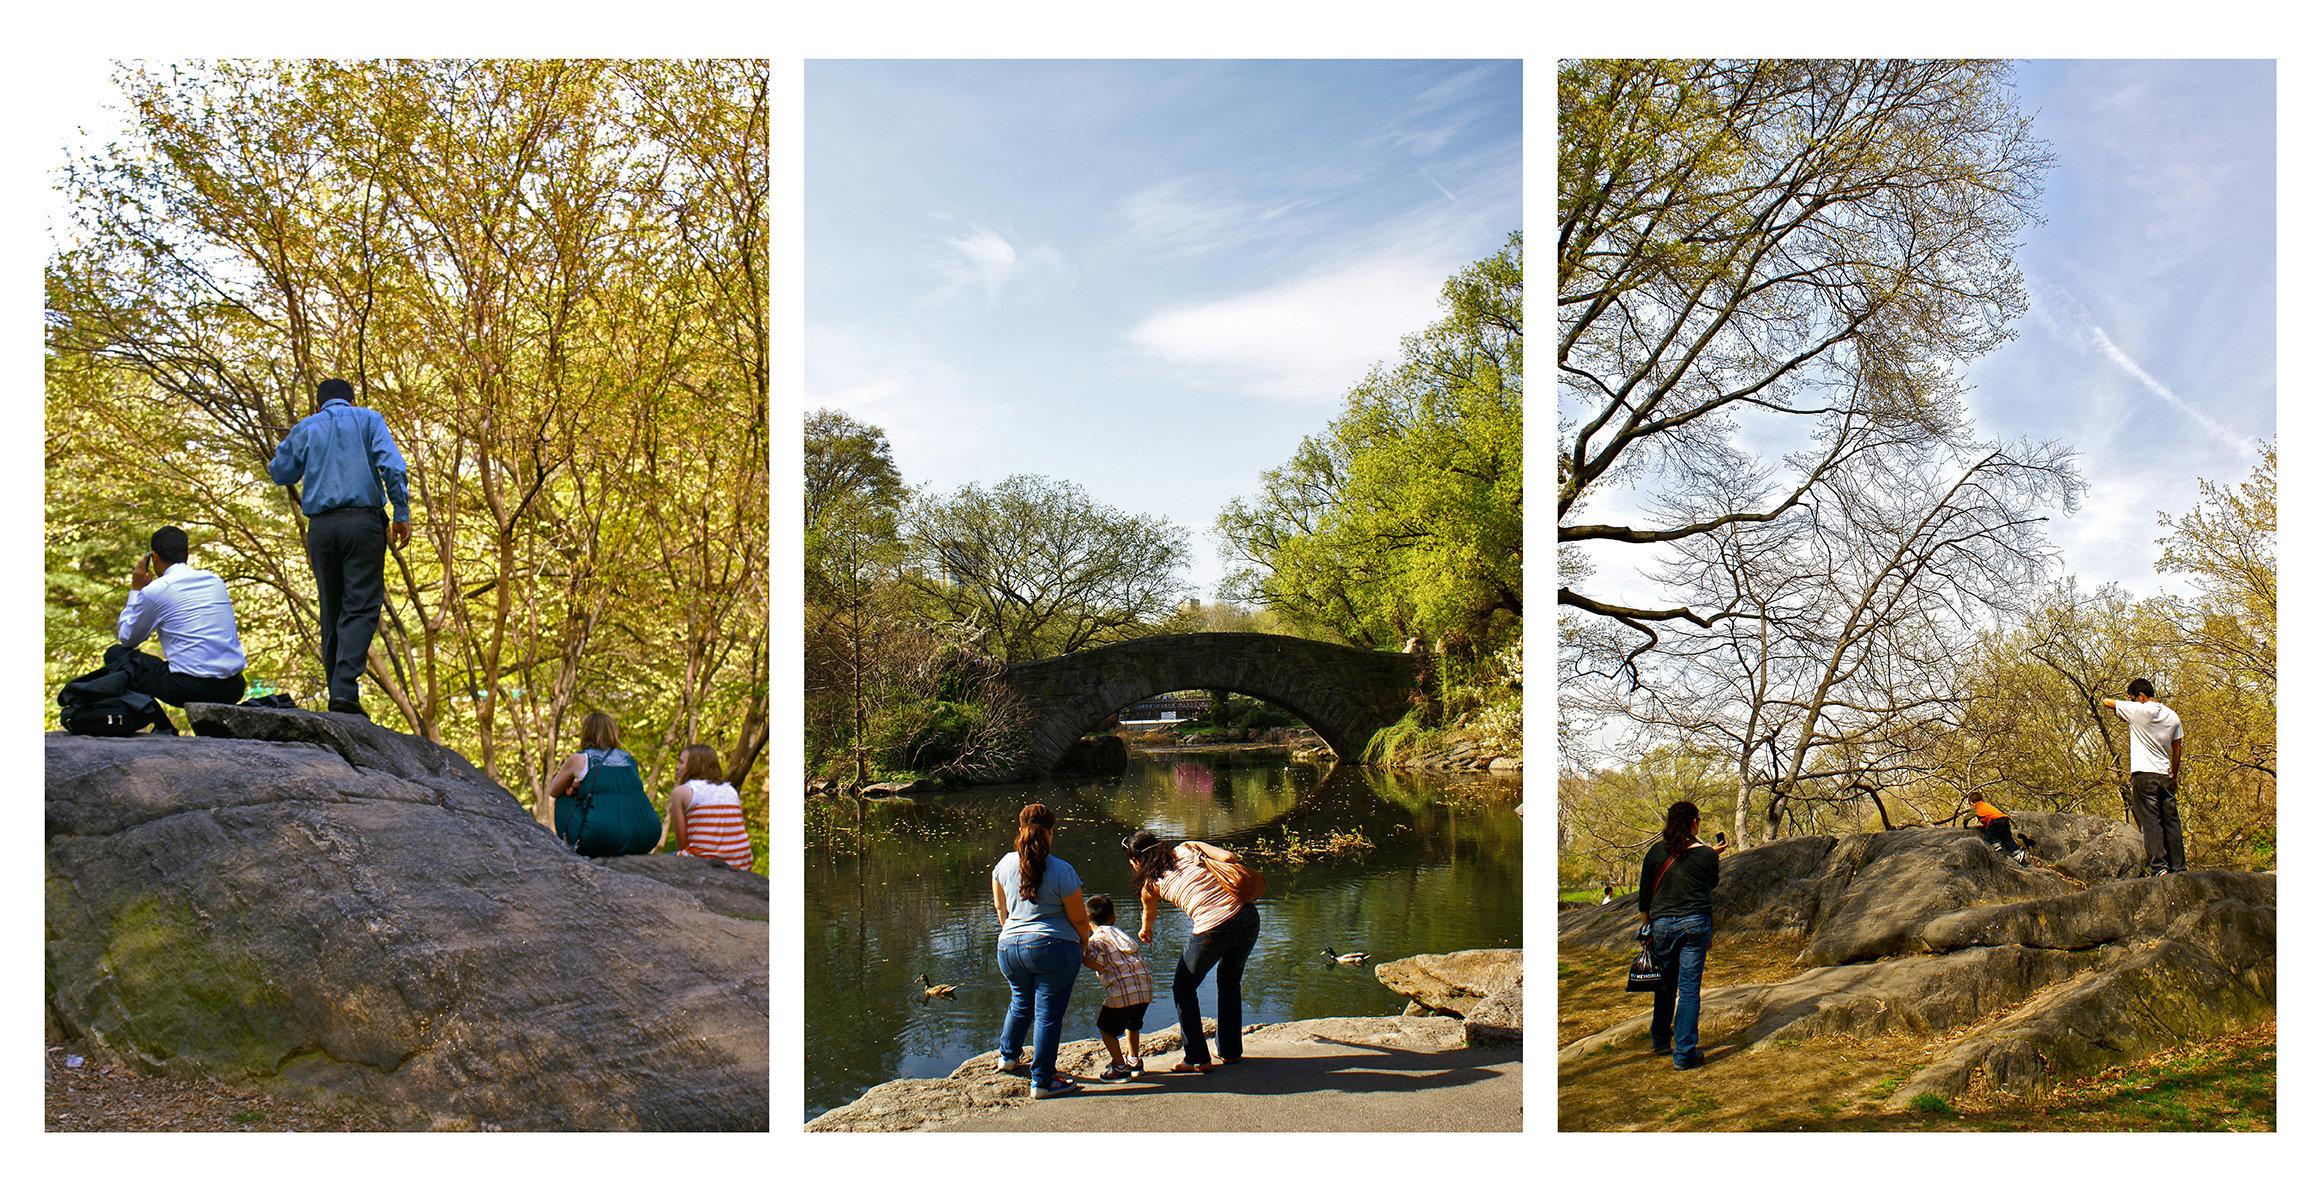 CDM_central_park2010_2.jpg